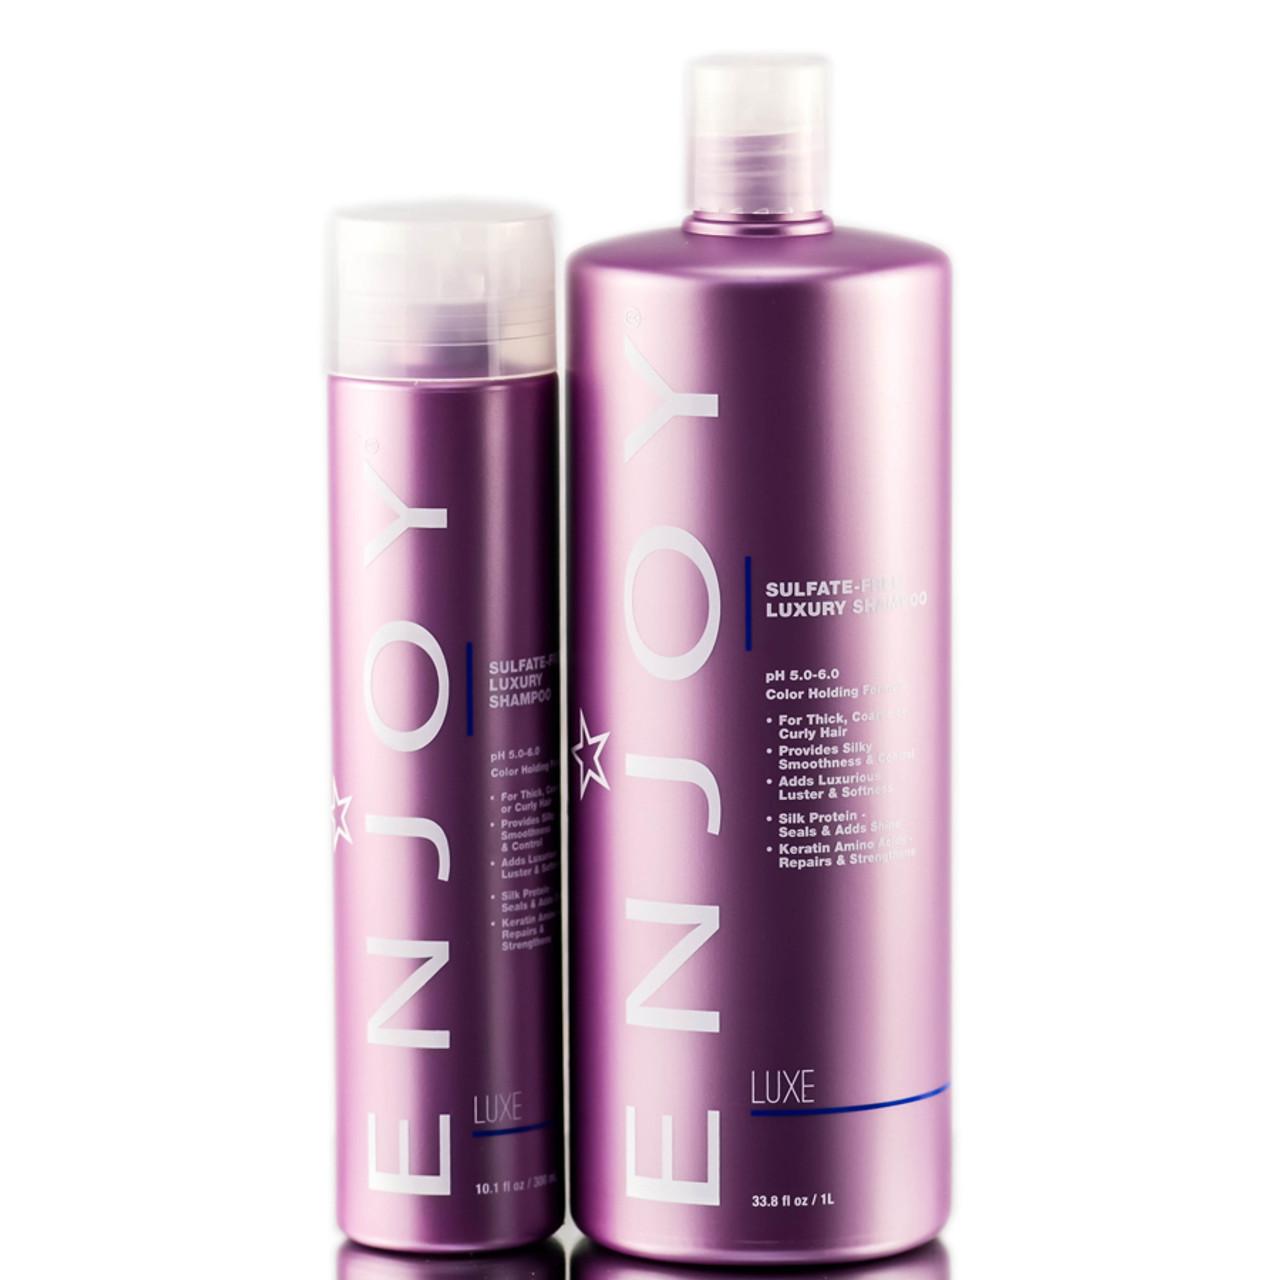 Enjoy Sulfate-Free Luxury Shampoo - SleekShop.com ...